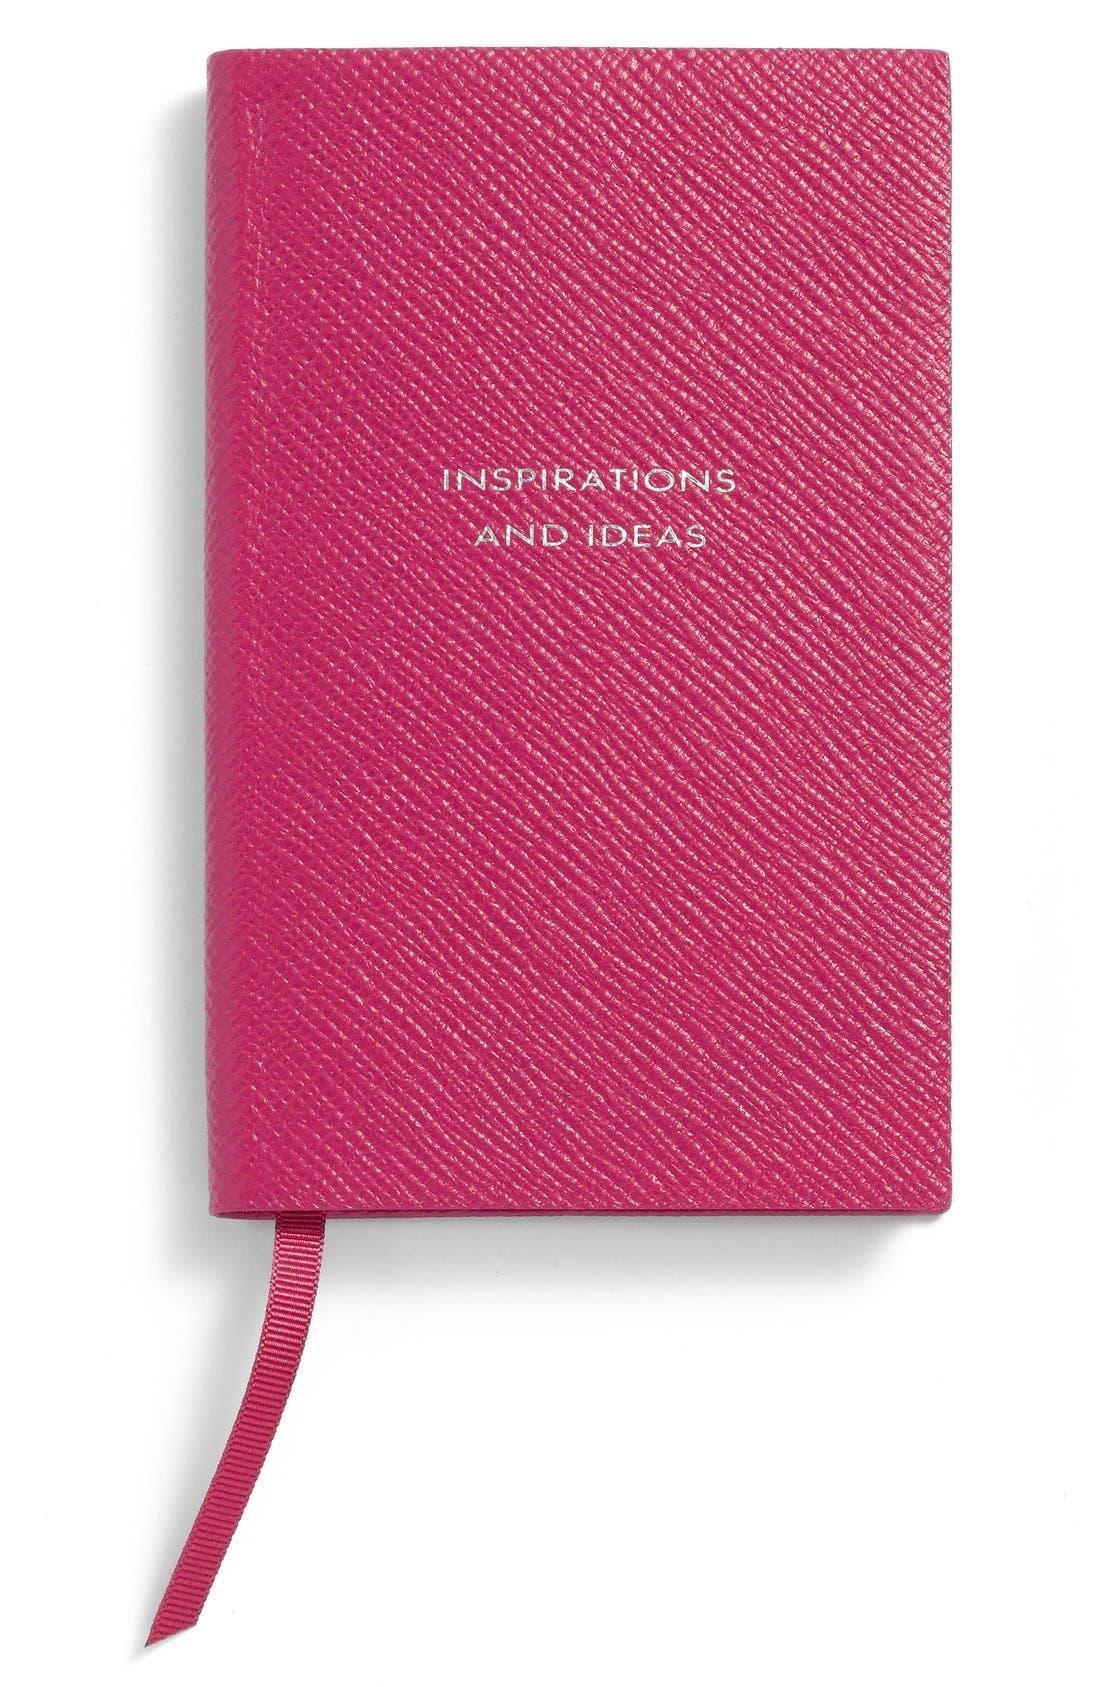 Main Image - Smythson 'Inspirations and Ideas - Panama' Pocket Notebook